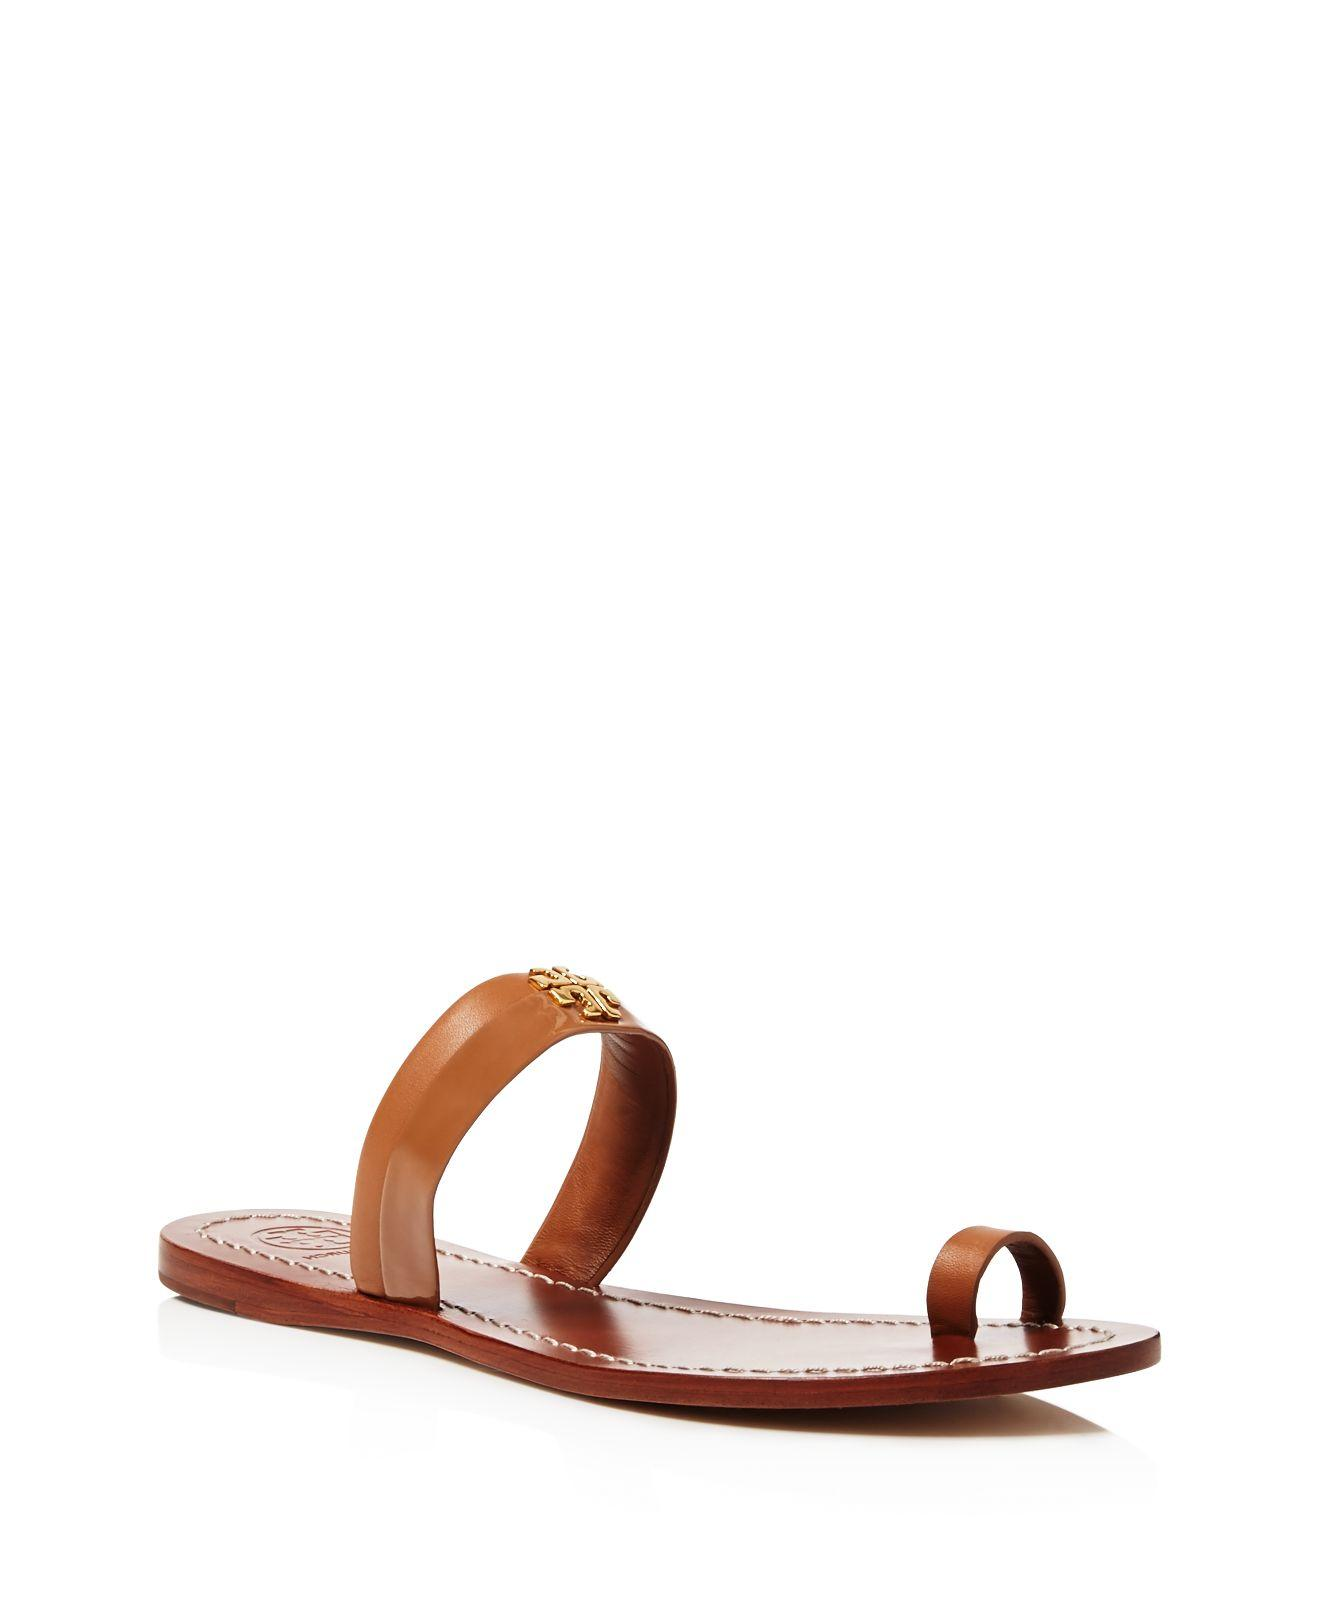 f67e22d8dc6a Lyst - Tory Burch Jolie Toe Ring Sandals in Brown